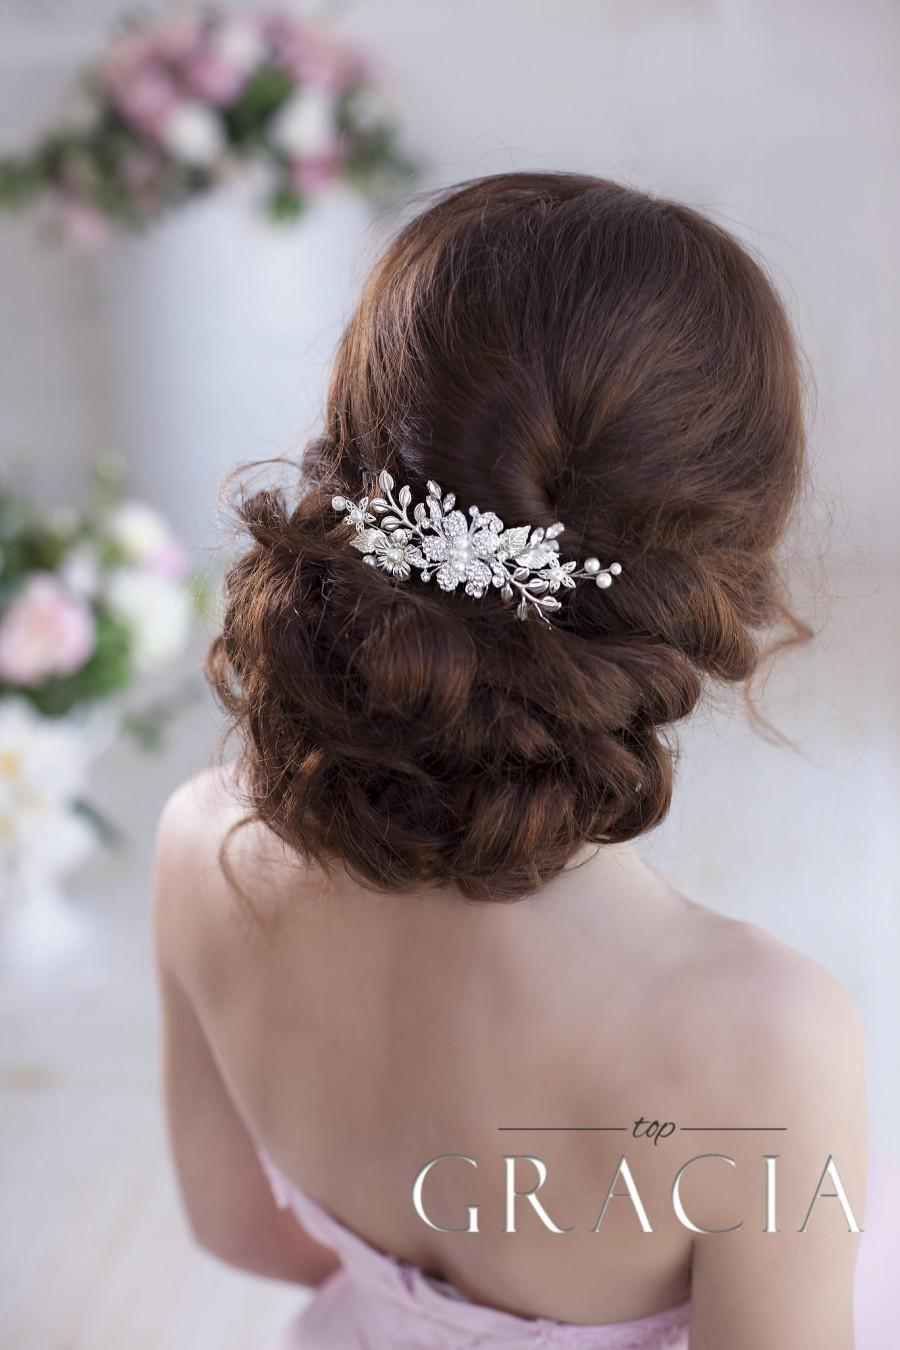 Wedding - Silver hair comb Leaf hair comb Wedding hair comb Bridal hair comb Flower hair comb Crystal hair comb Bridal comb Wedding comb Silver comb